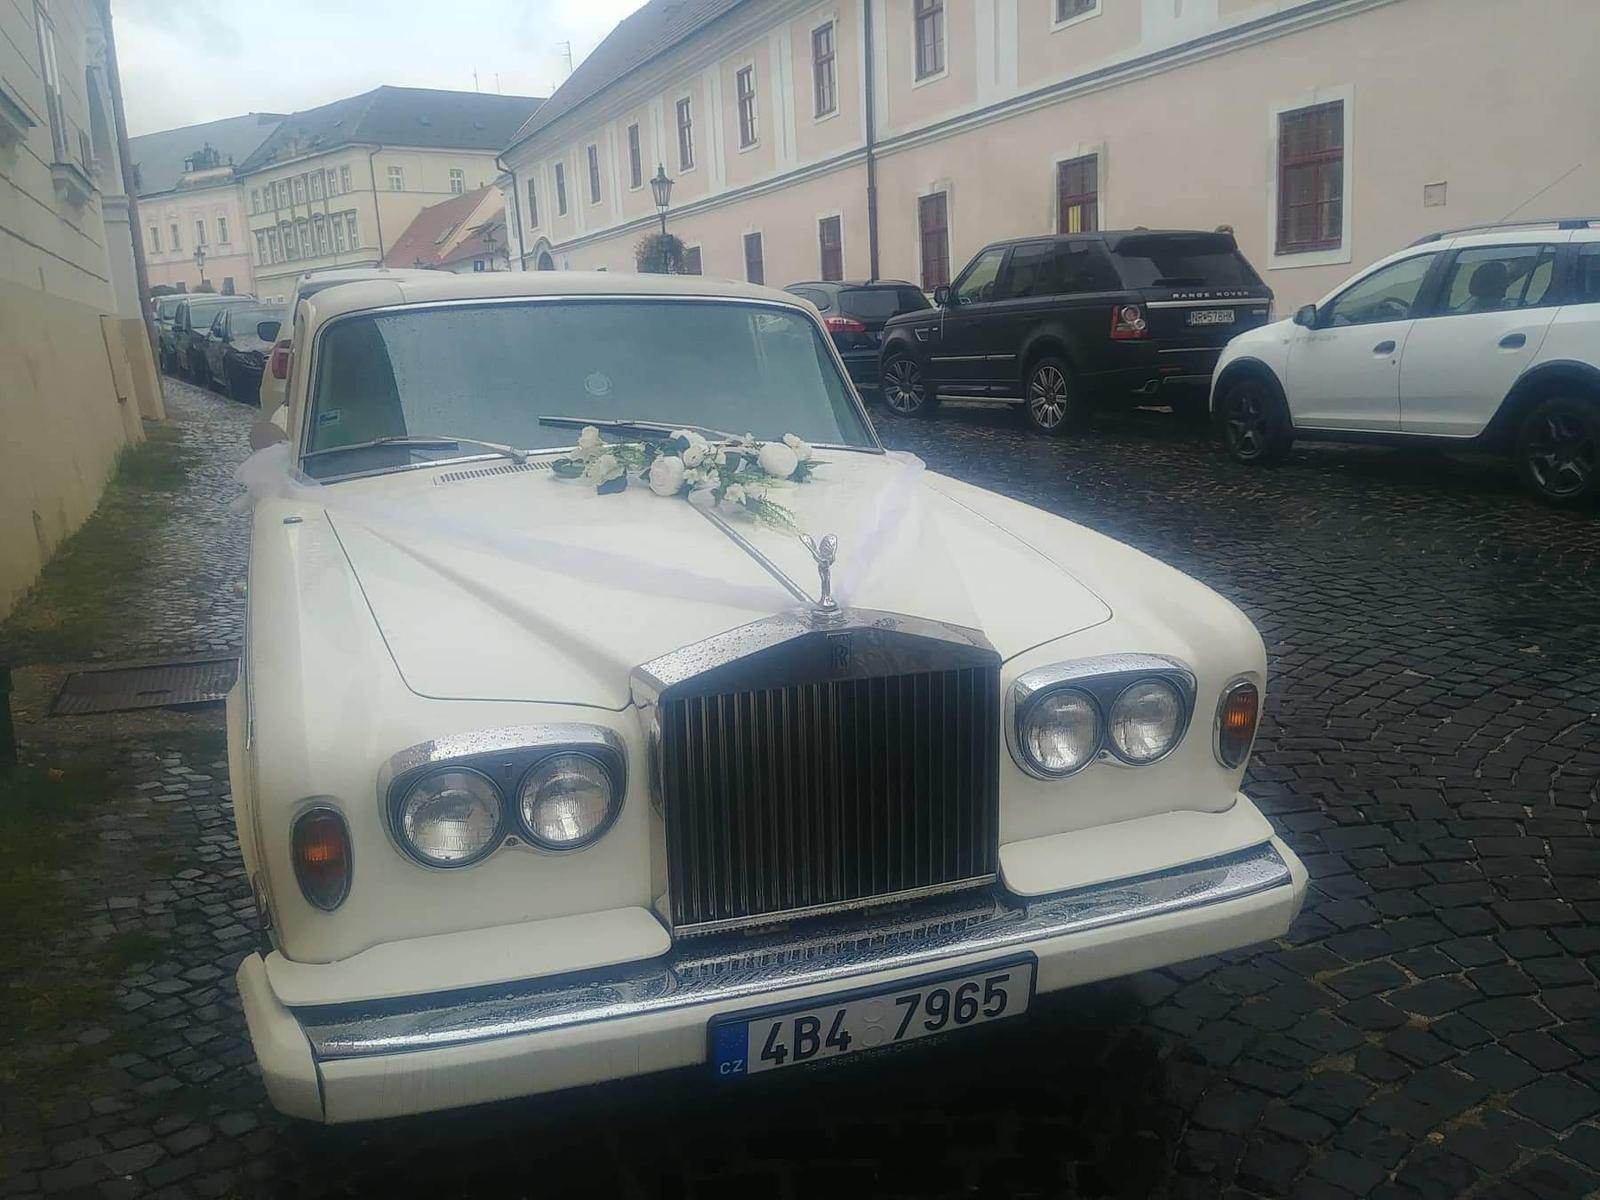 Rolls Royce svadba v Nitre - Obrázok č. 4